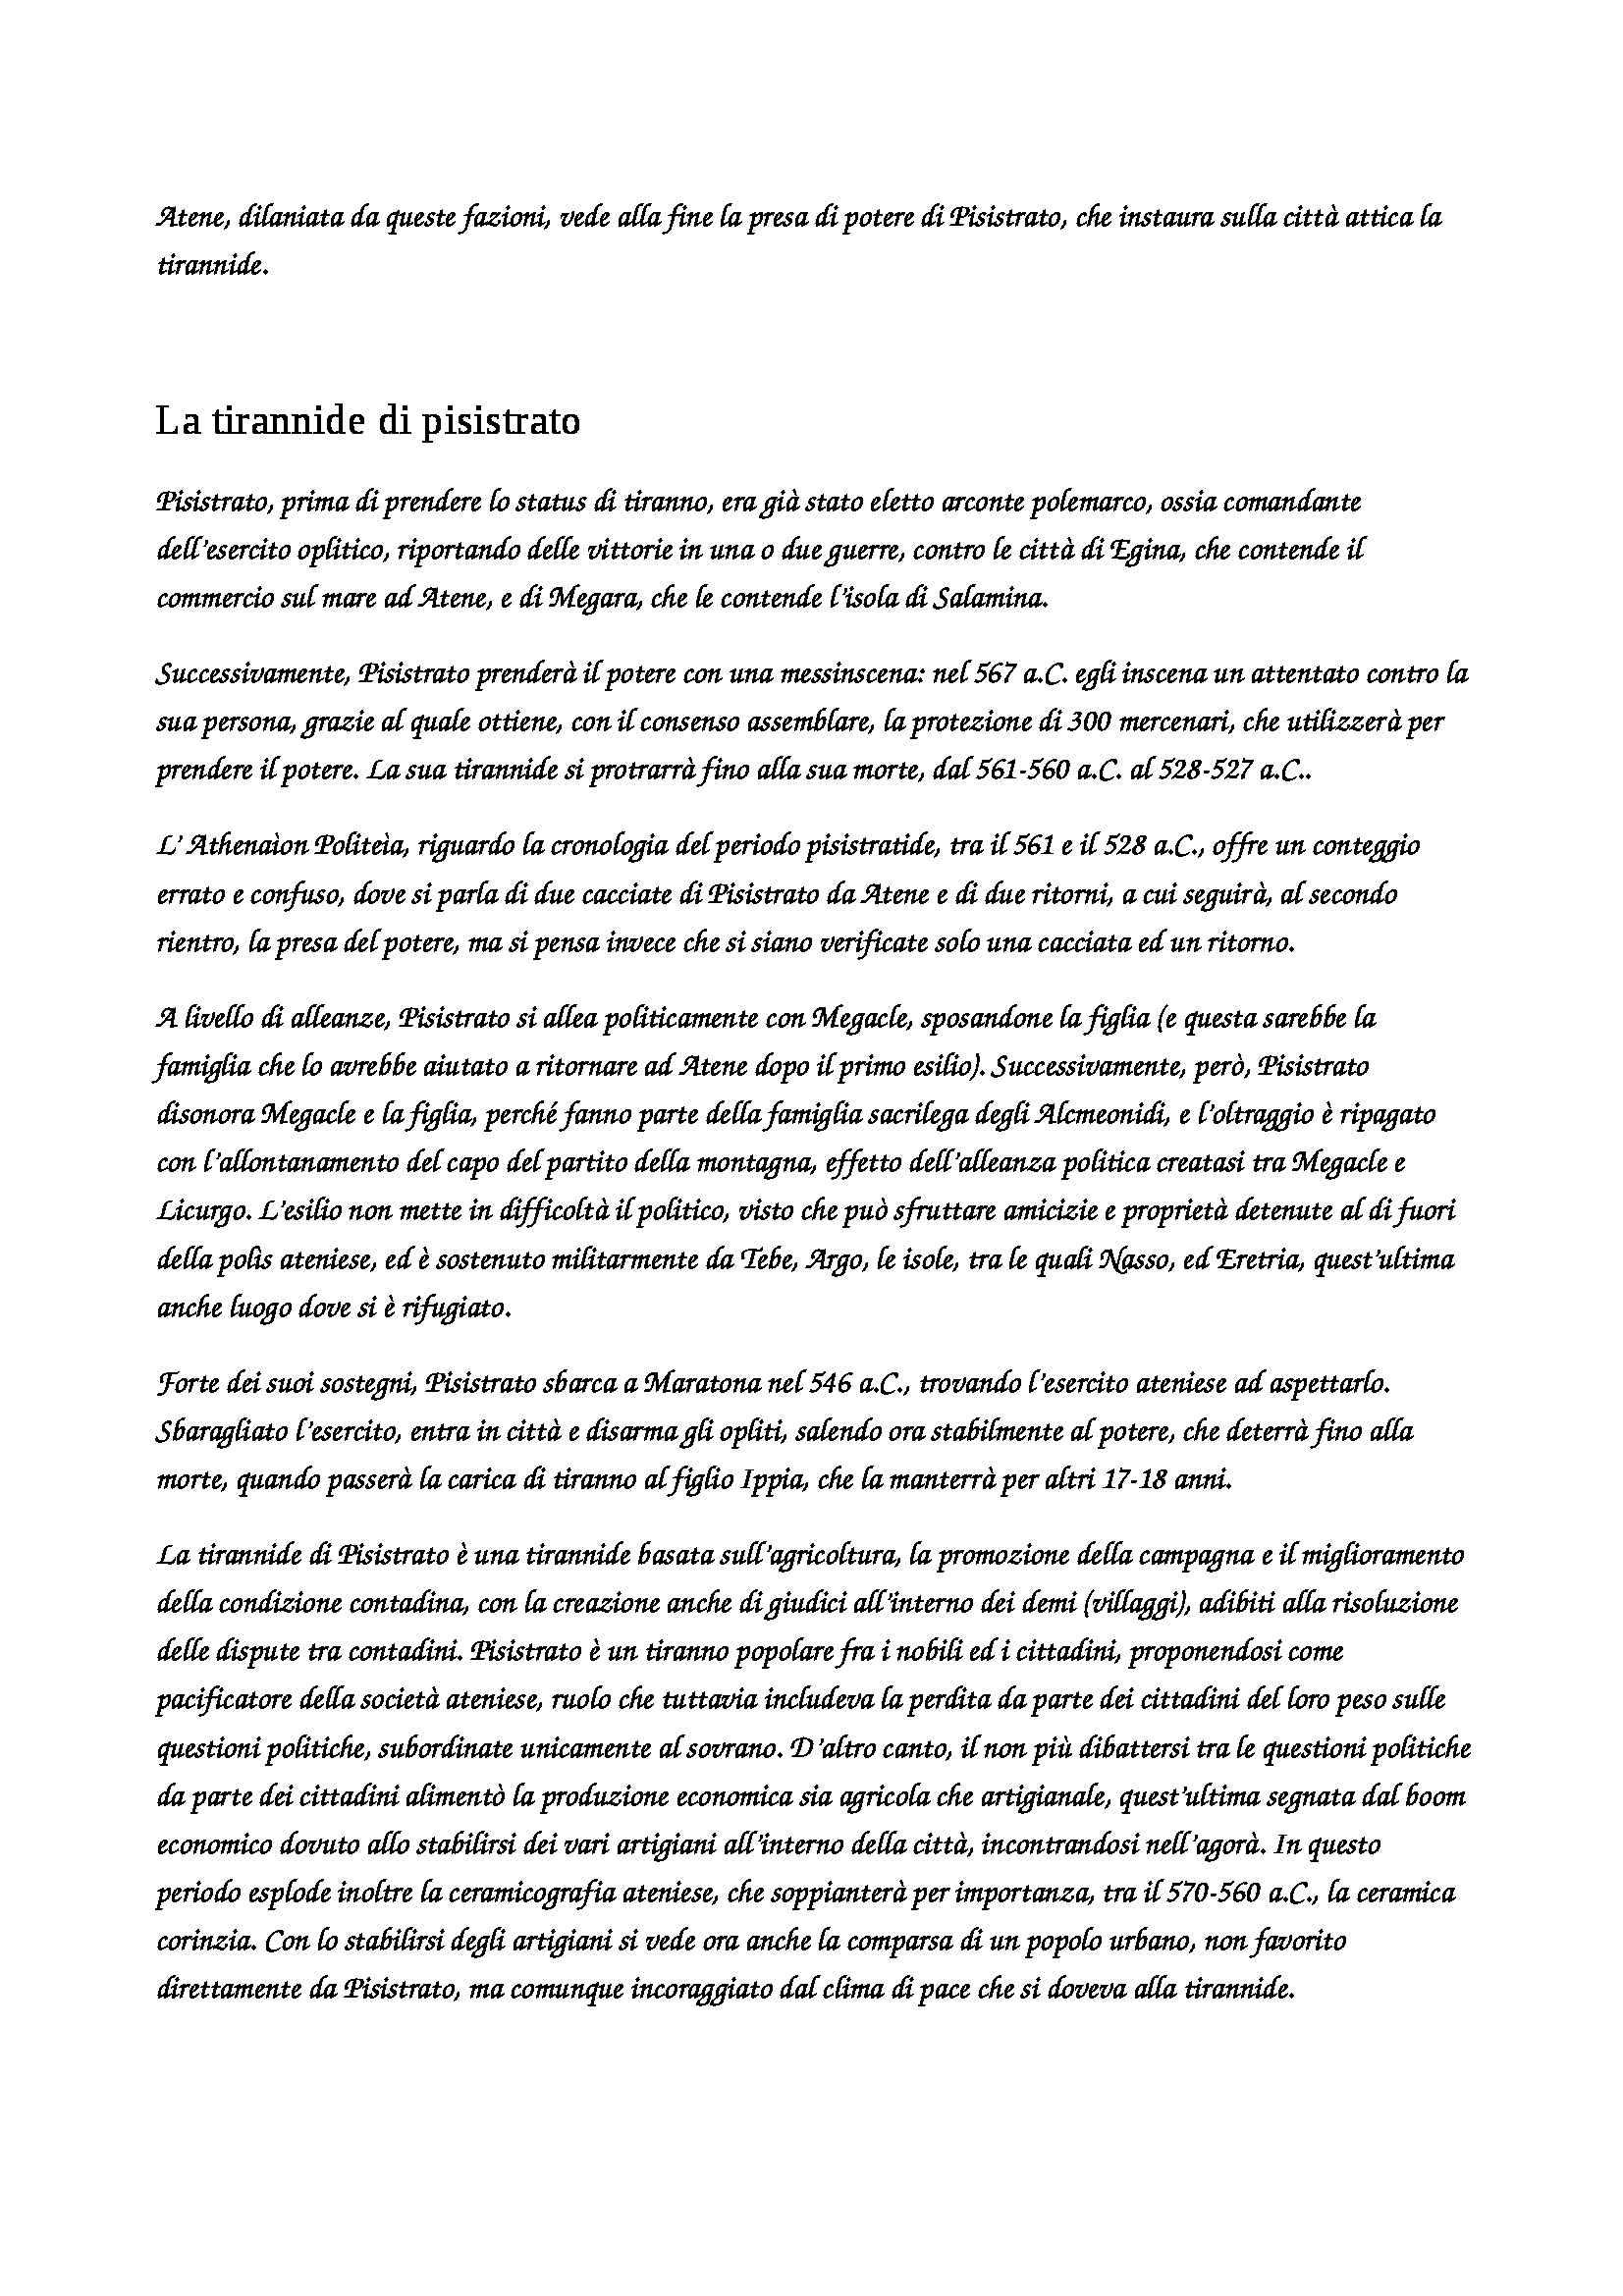 Storia Greca - Appunti Pag. 21